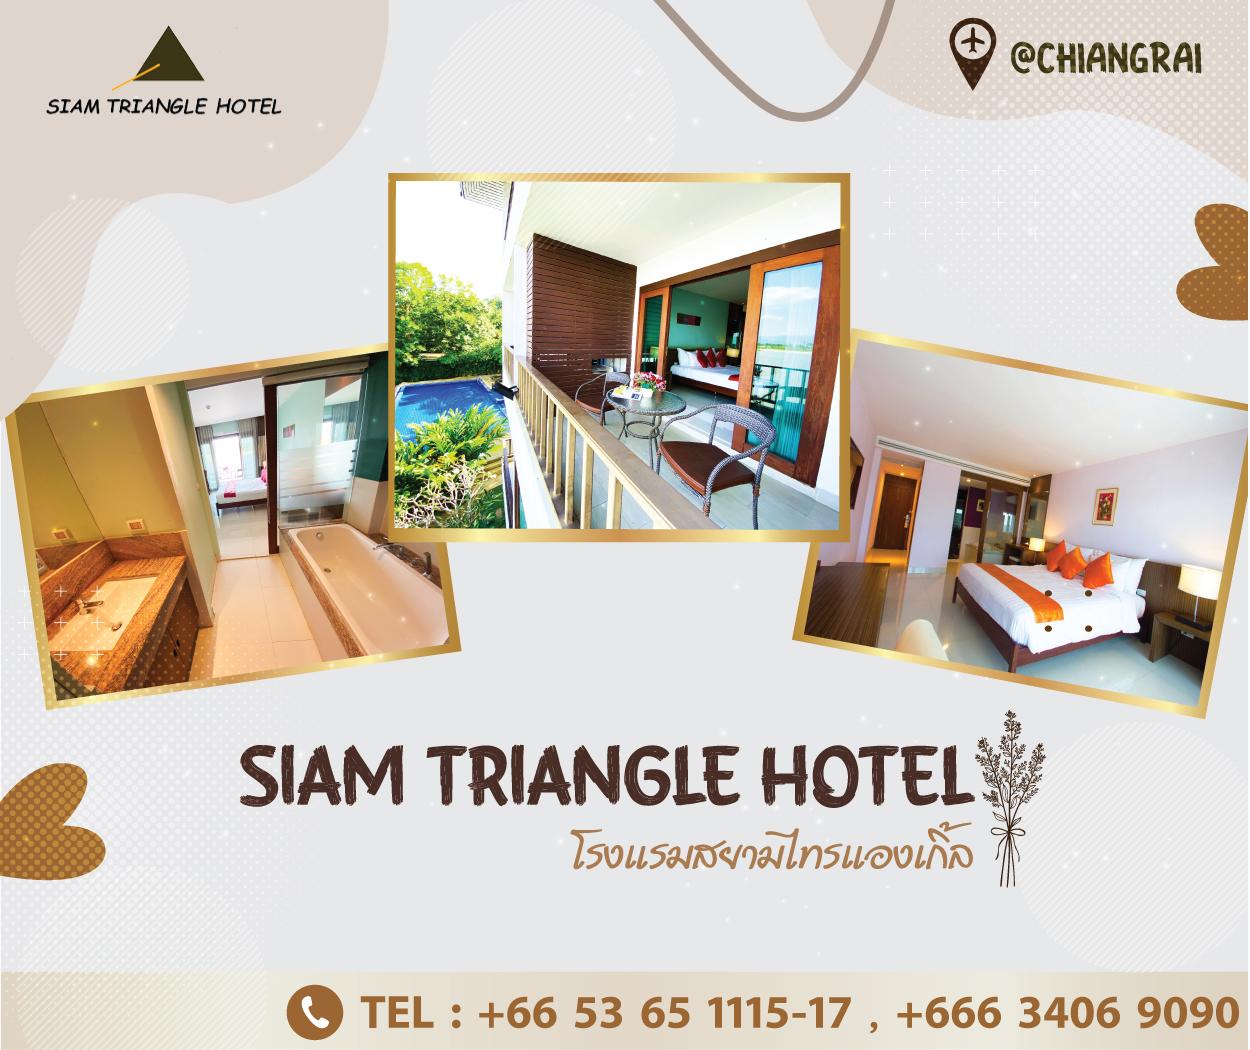 Siam Triangle Hotel Chiang Saen, Chiangrai